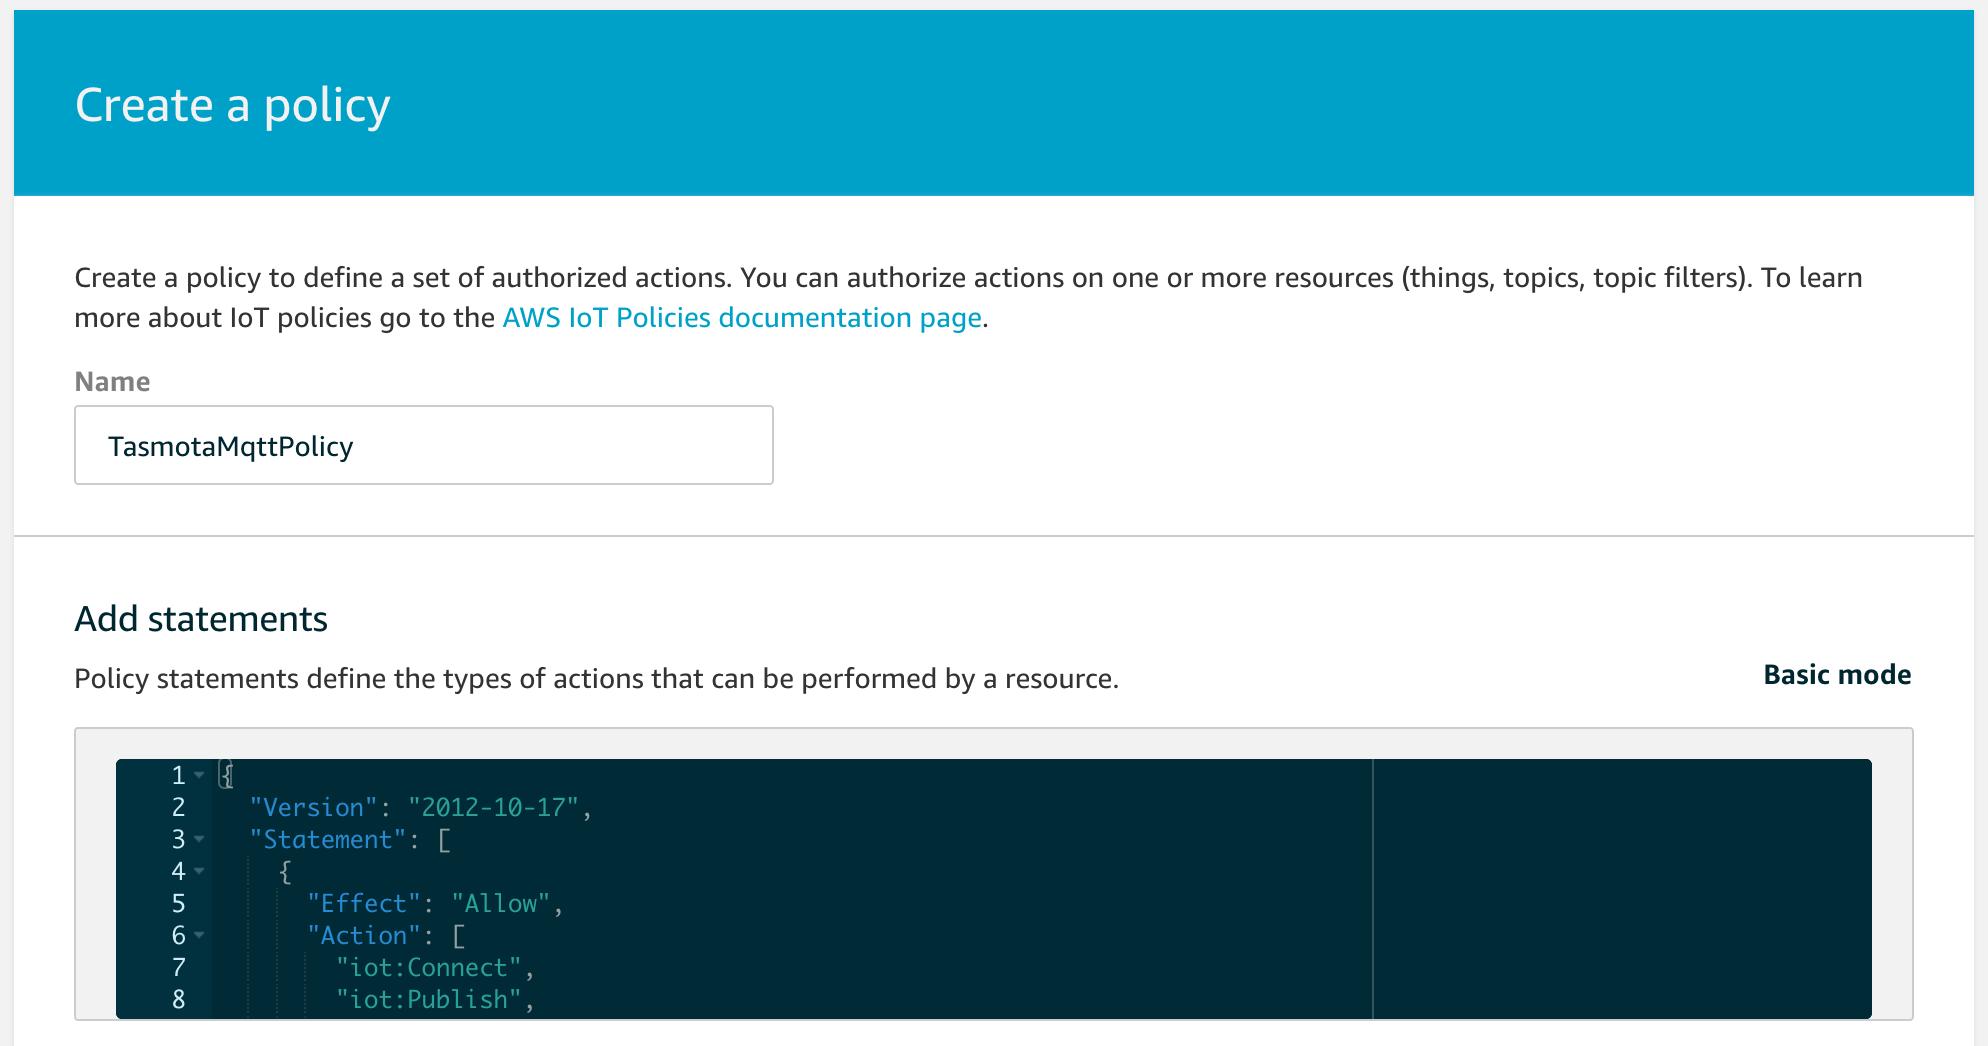 AWS IoT · arendst/Sonoff-Tasmota Wiki · GitHub